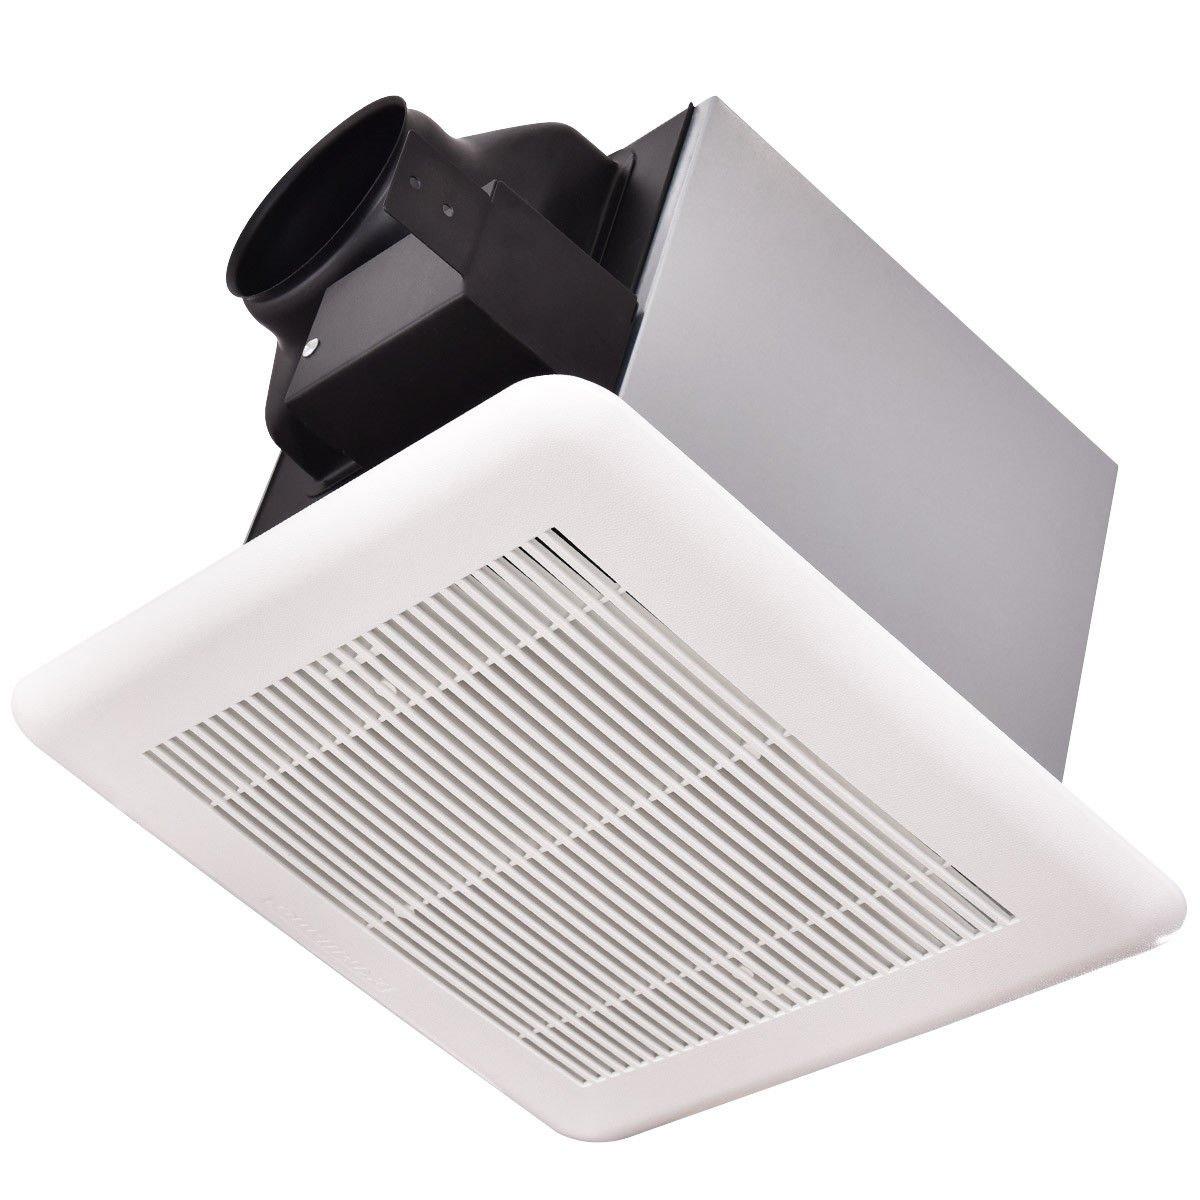 Bathroom 100 CFM Ceiling Wall Mounted Exhaust Fan Air Ventilation 1 Sone White